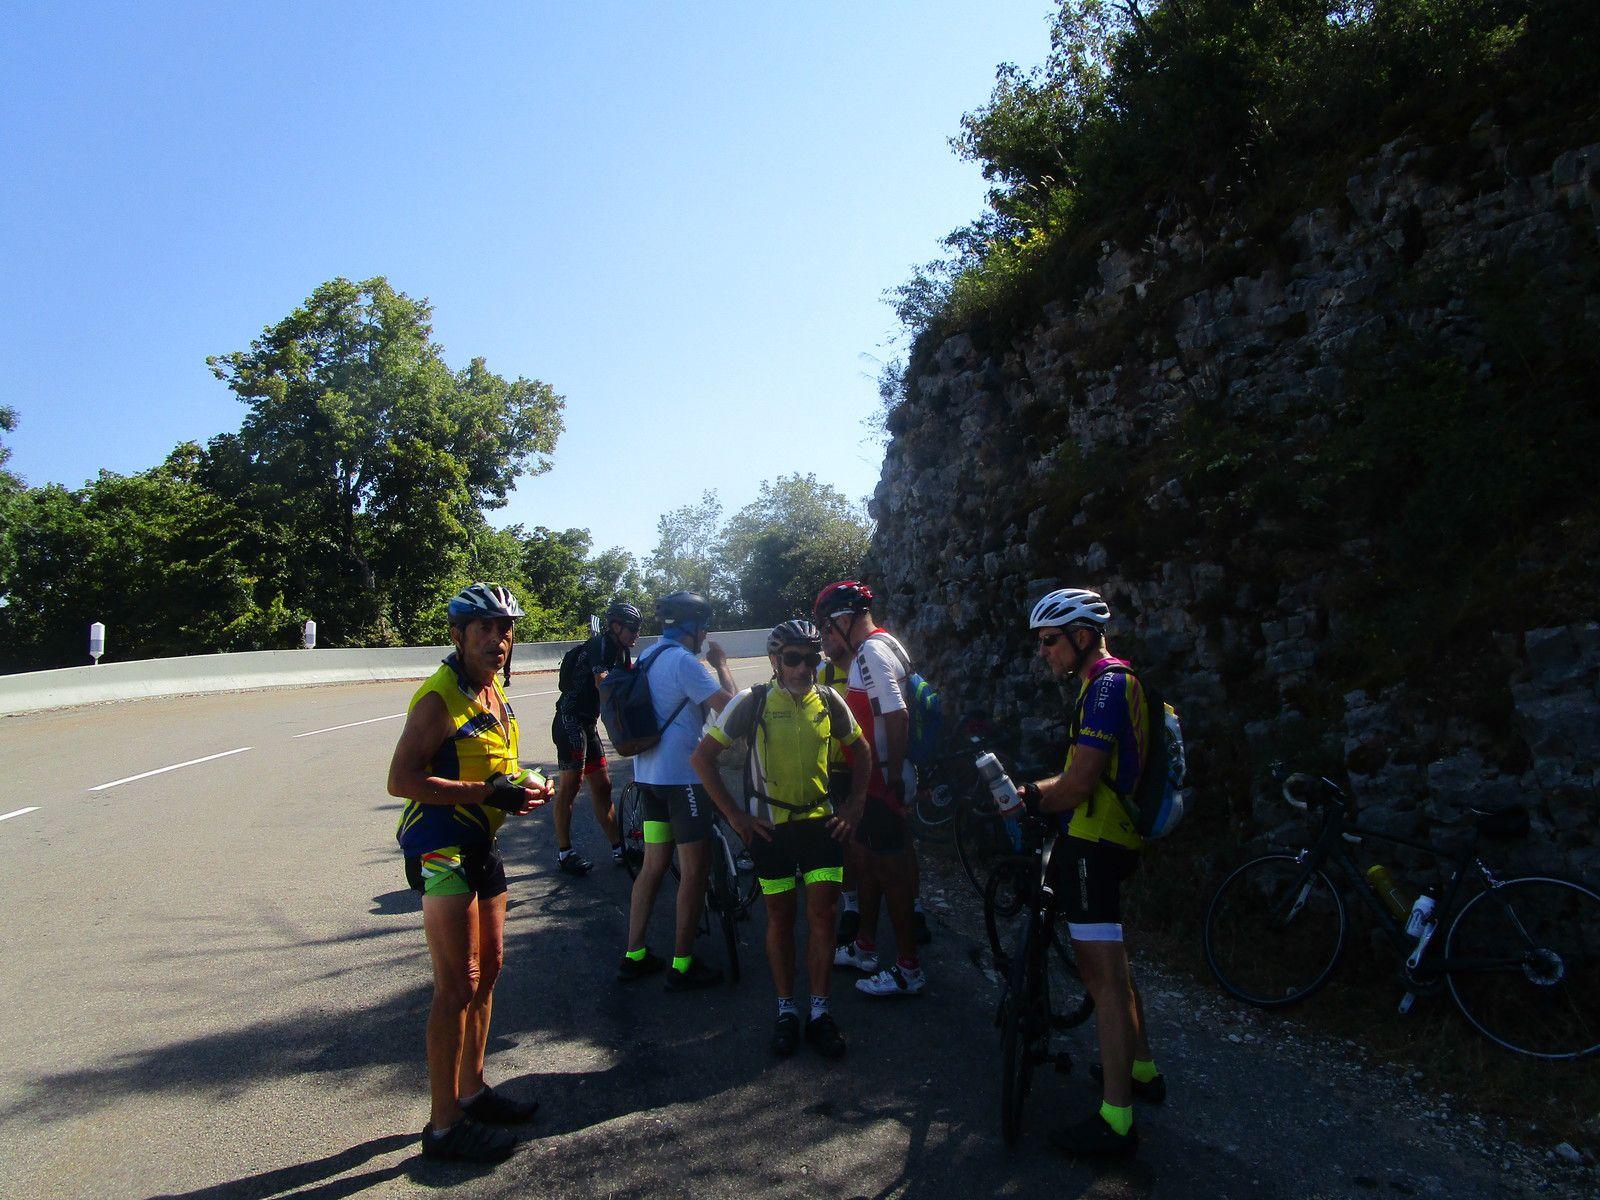 St Marcellin (38)-  Vercors,Combe Laval et Col de La Machine-  Jeudi 30 Juin 2020